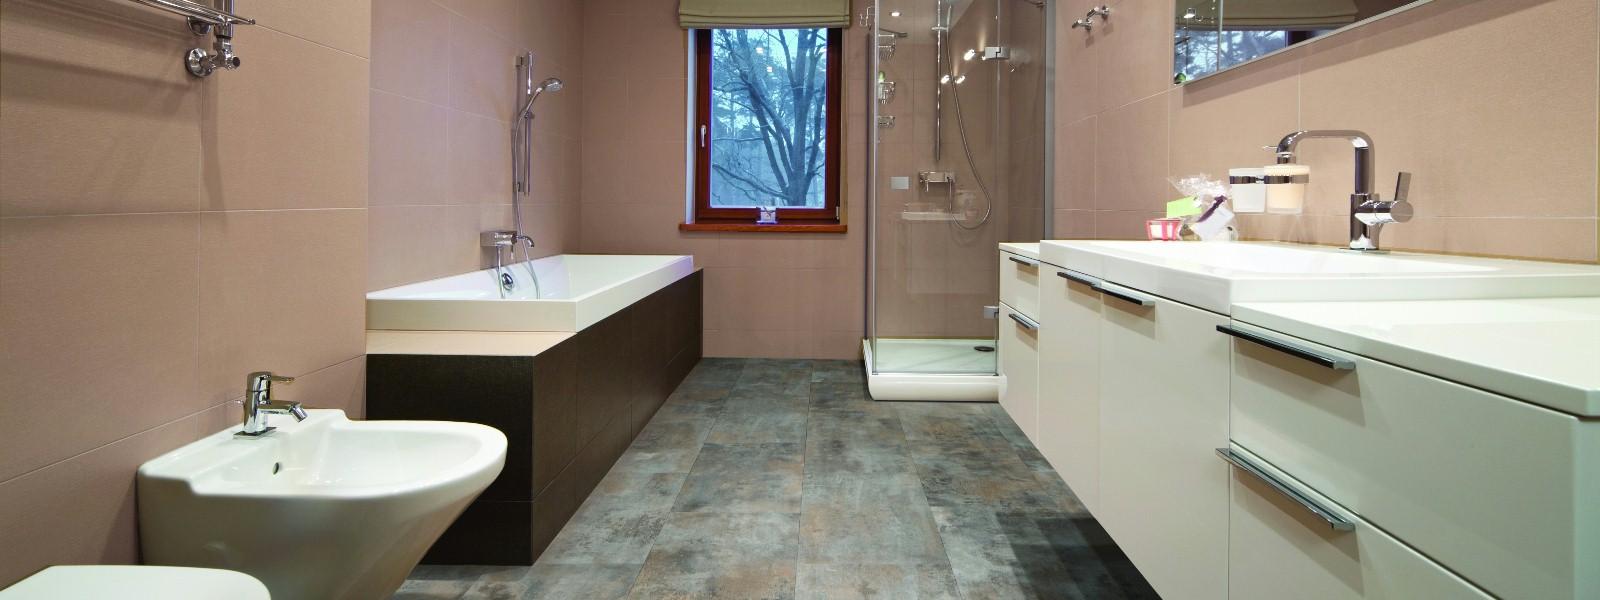 slide4 bathroom flooring - What Is The Best Flooring For A Bathroom?